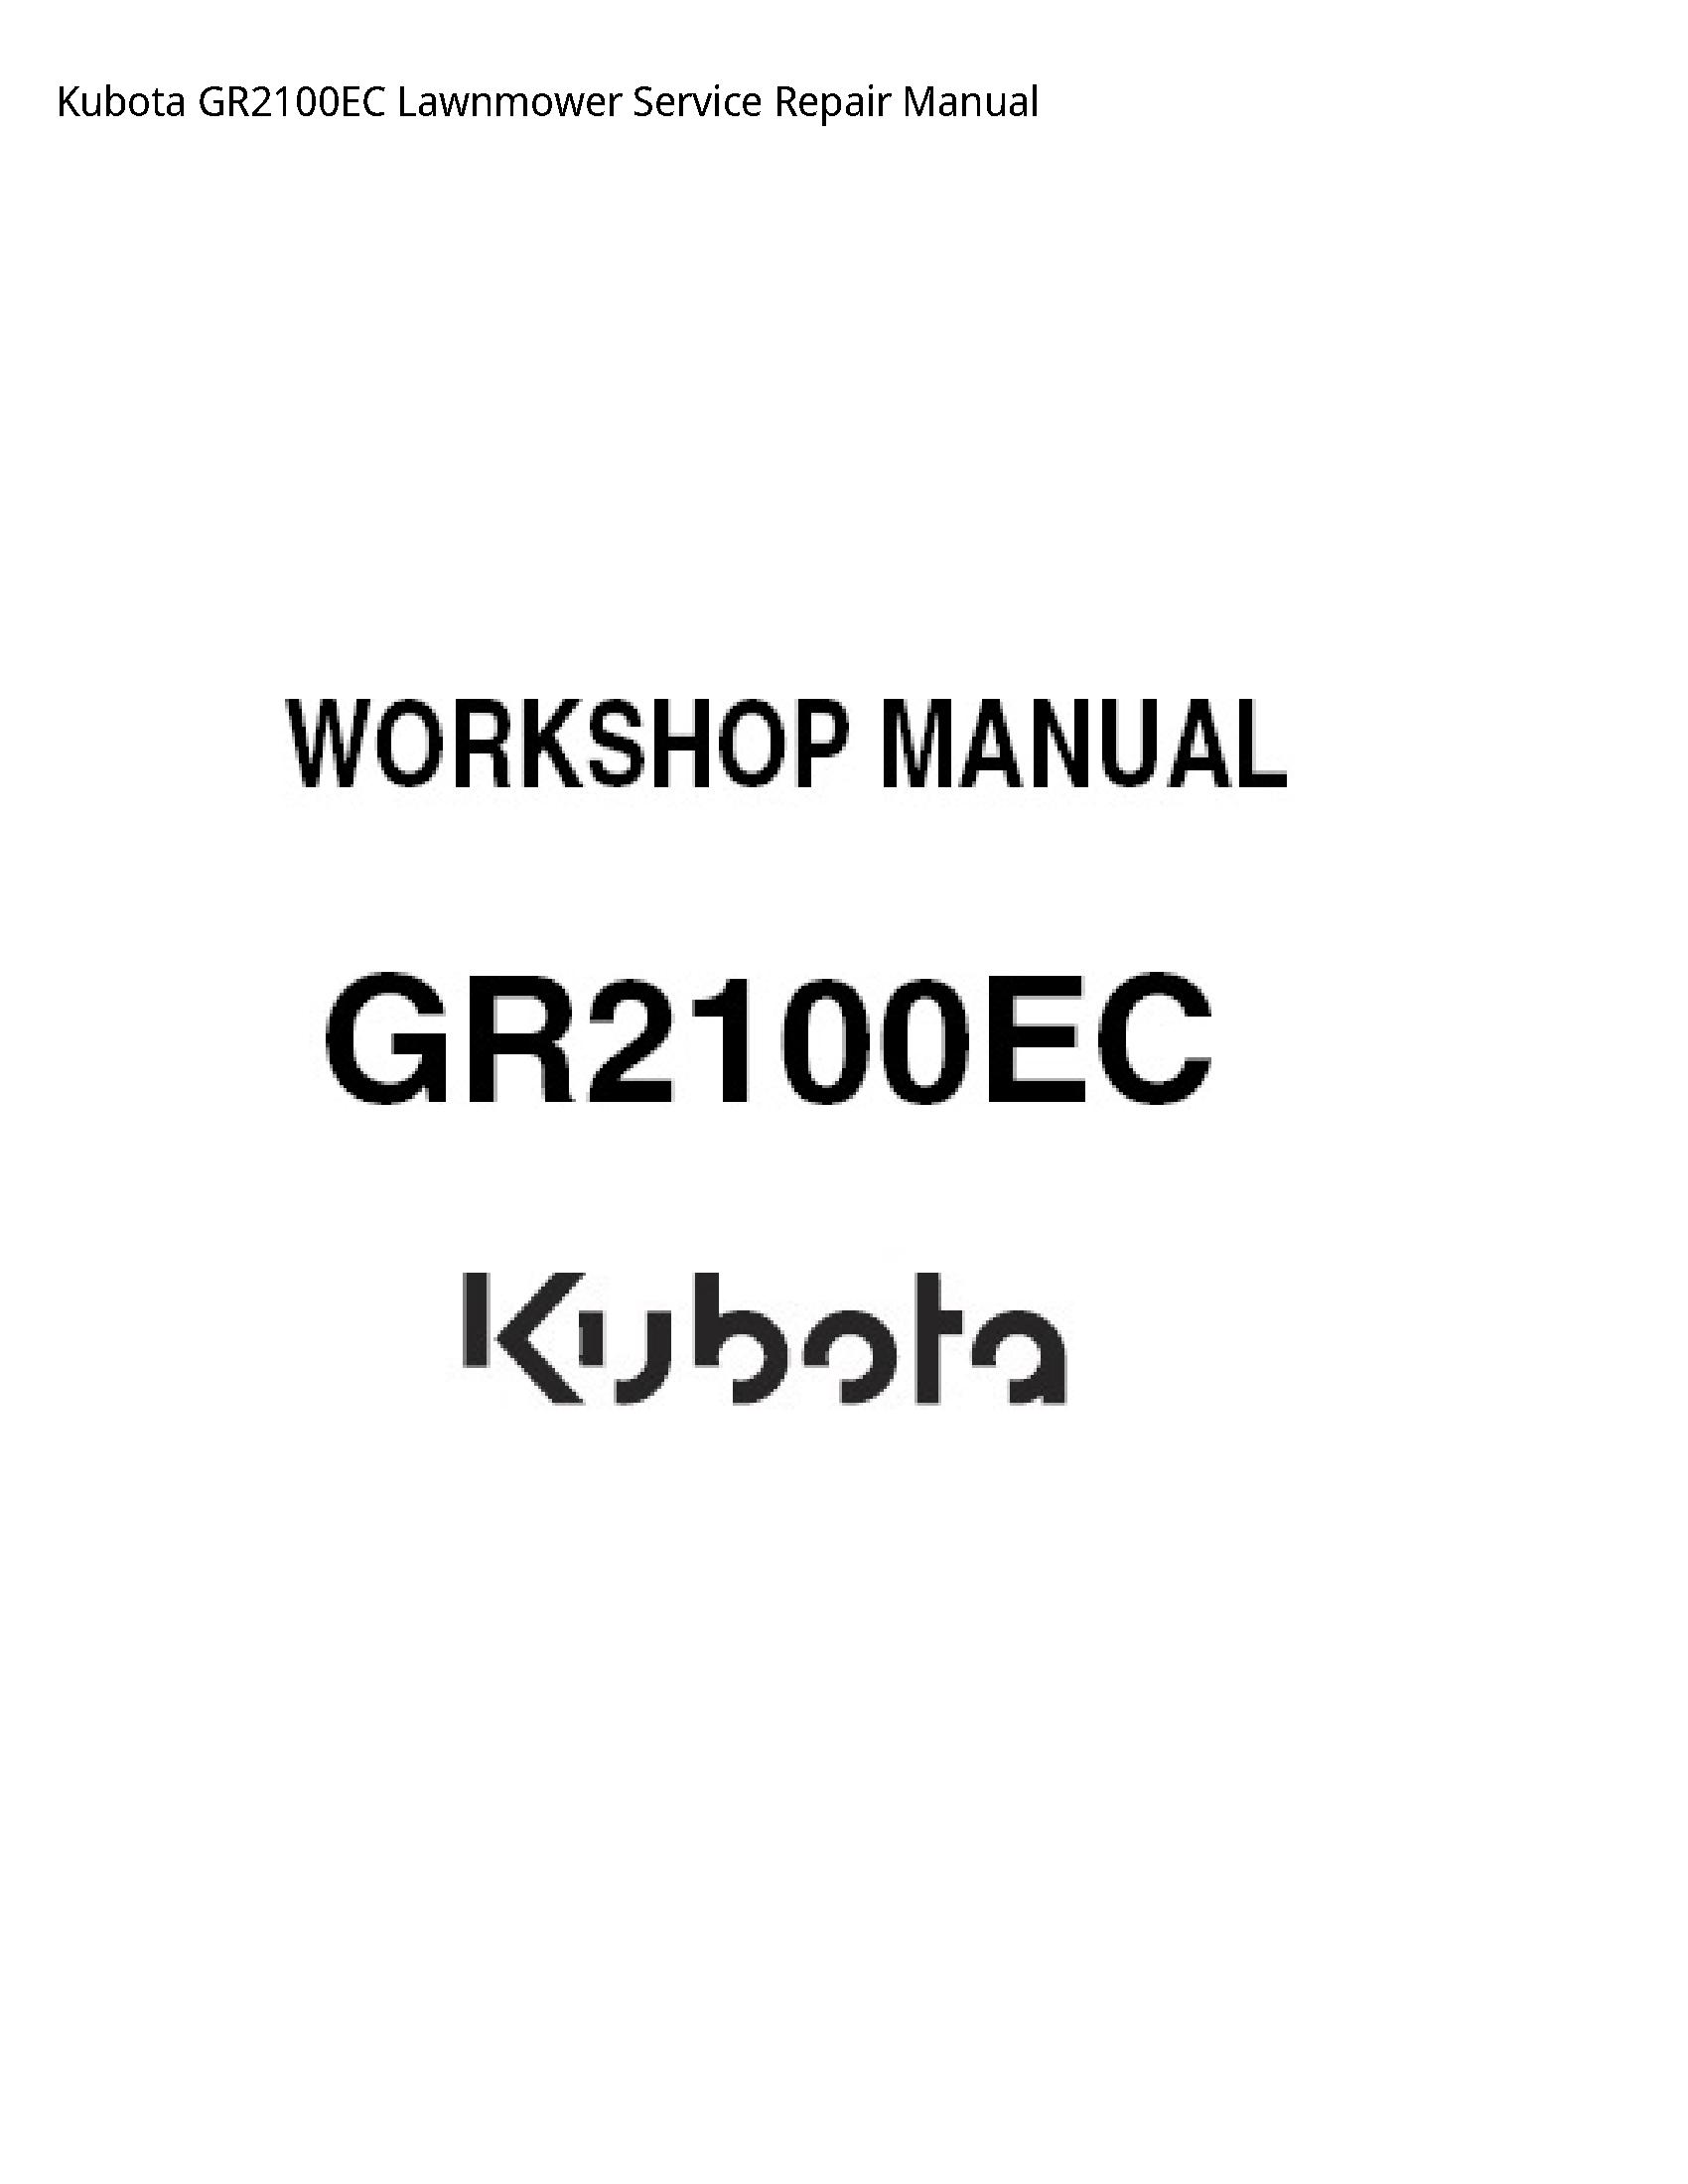 Kubota GR2100EC Lawnmower manual